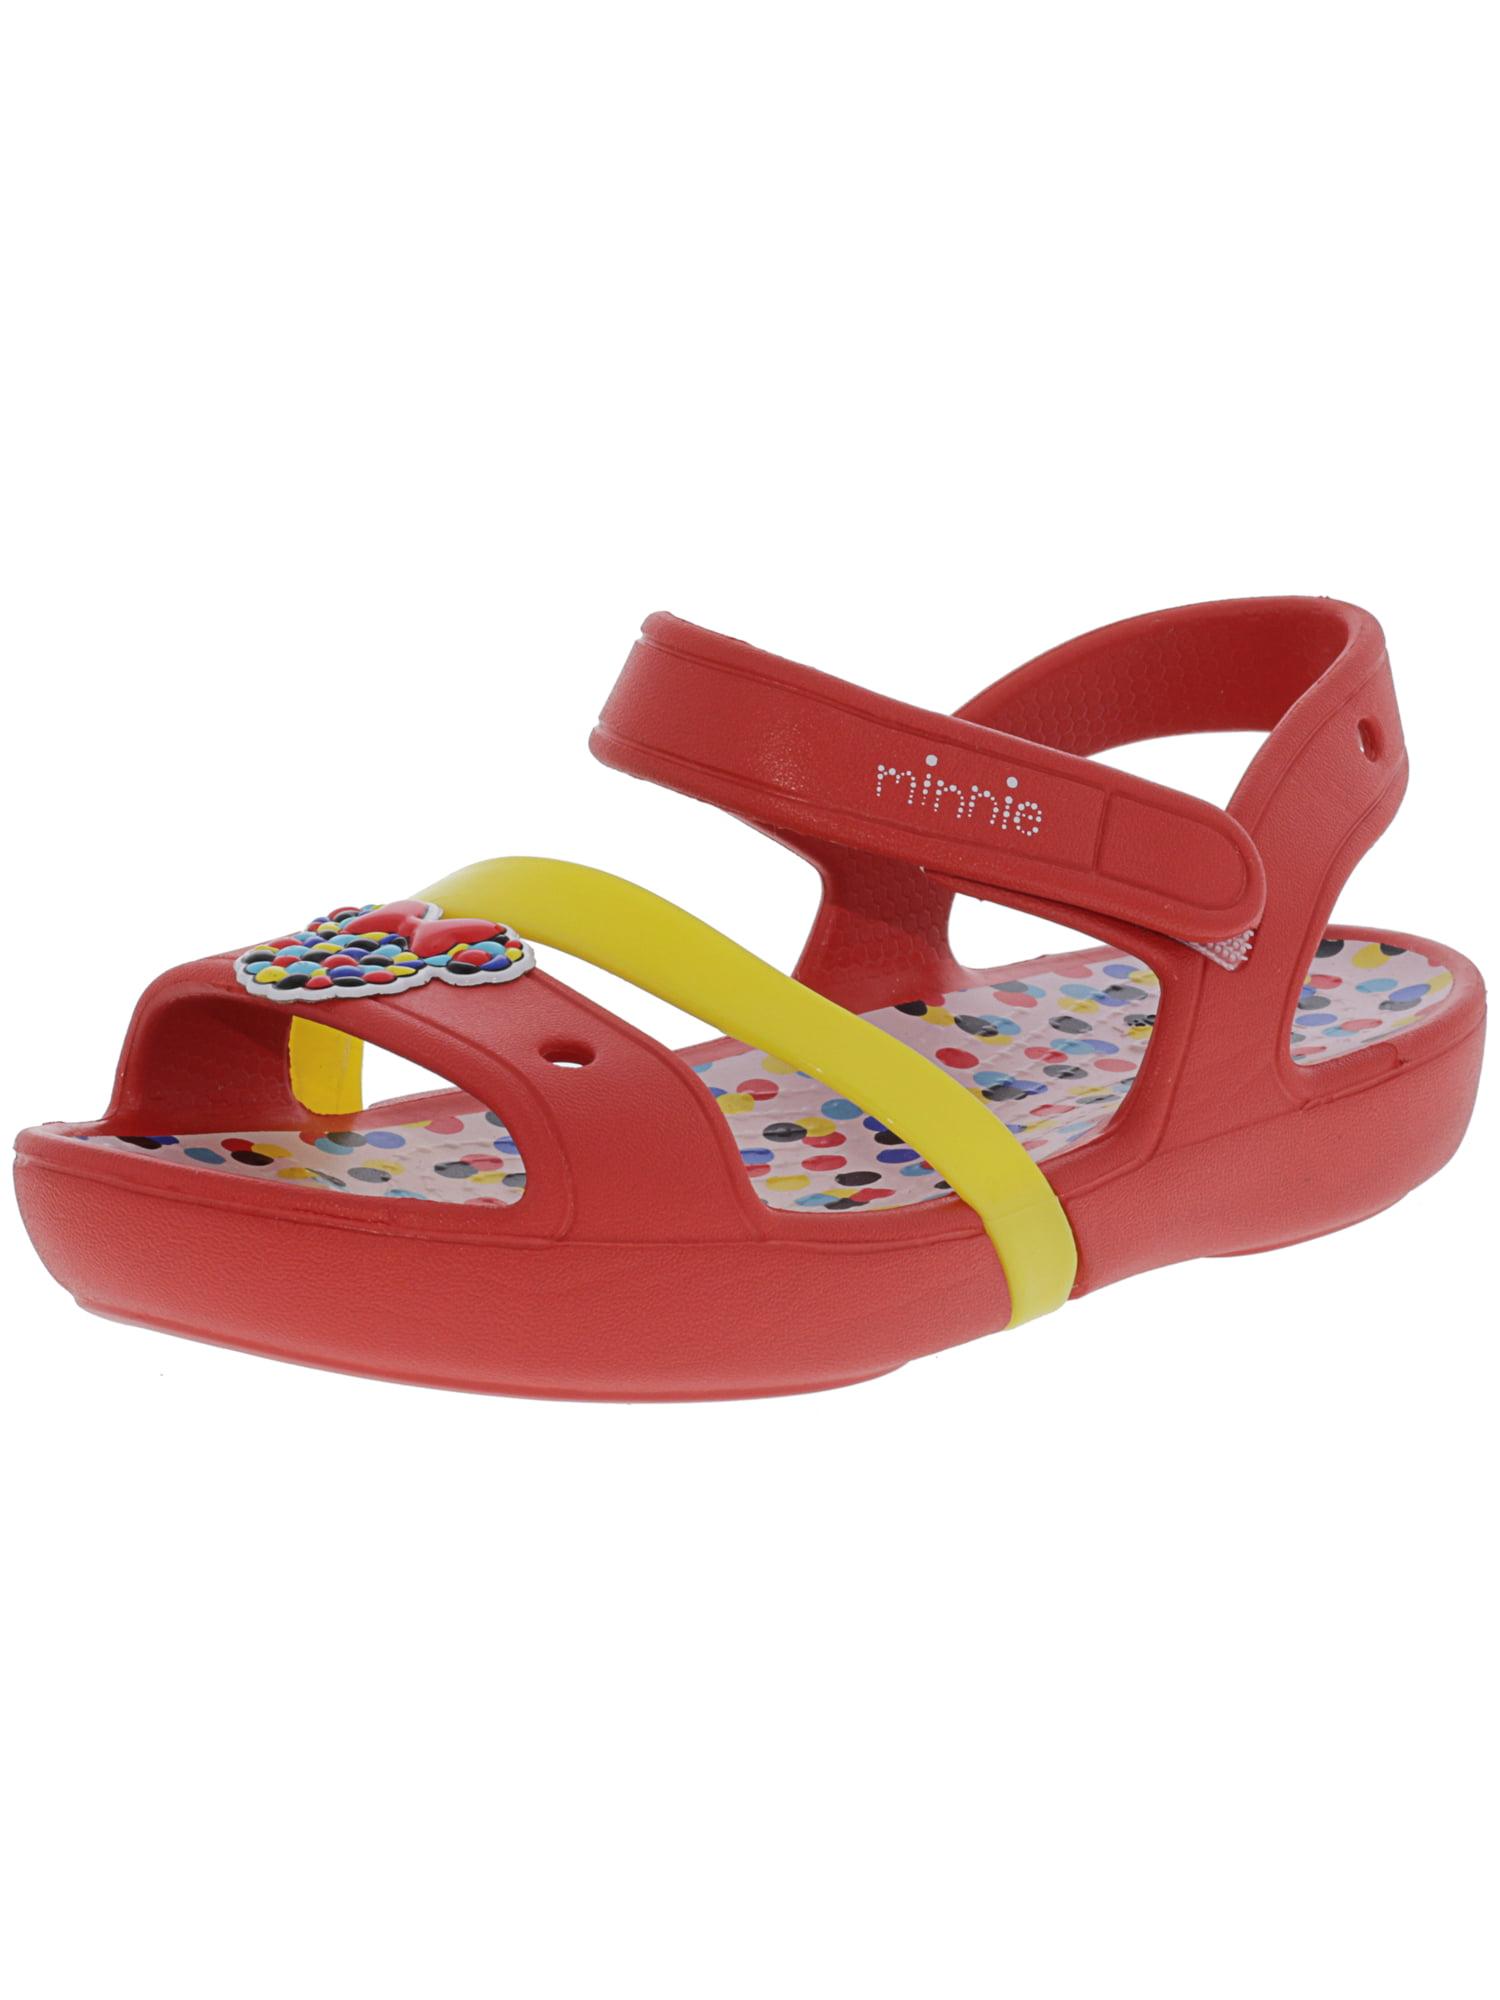 4c4159ad549b24 Crocs Girl s Lina Minnie Sandal Dots - 12M